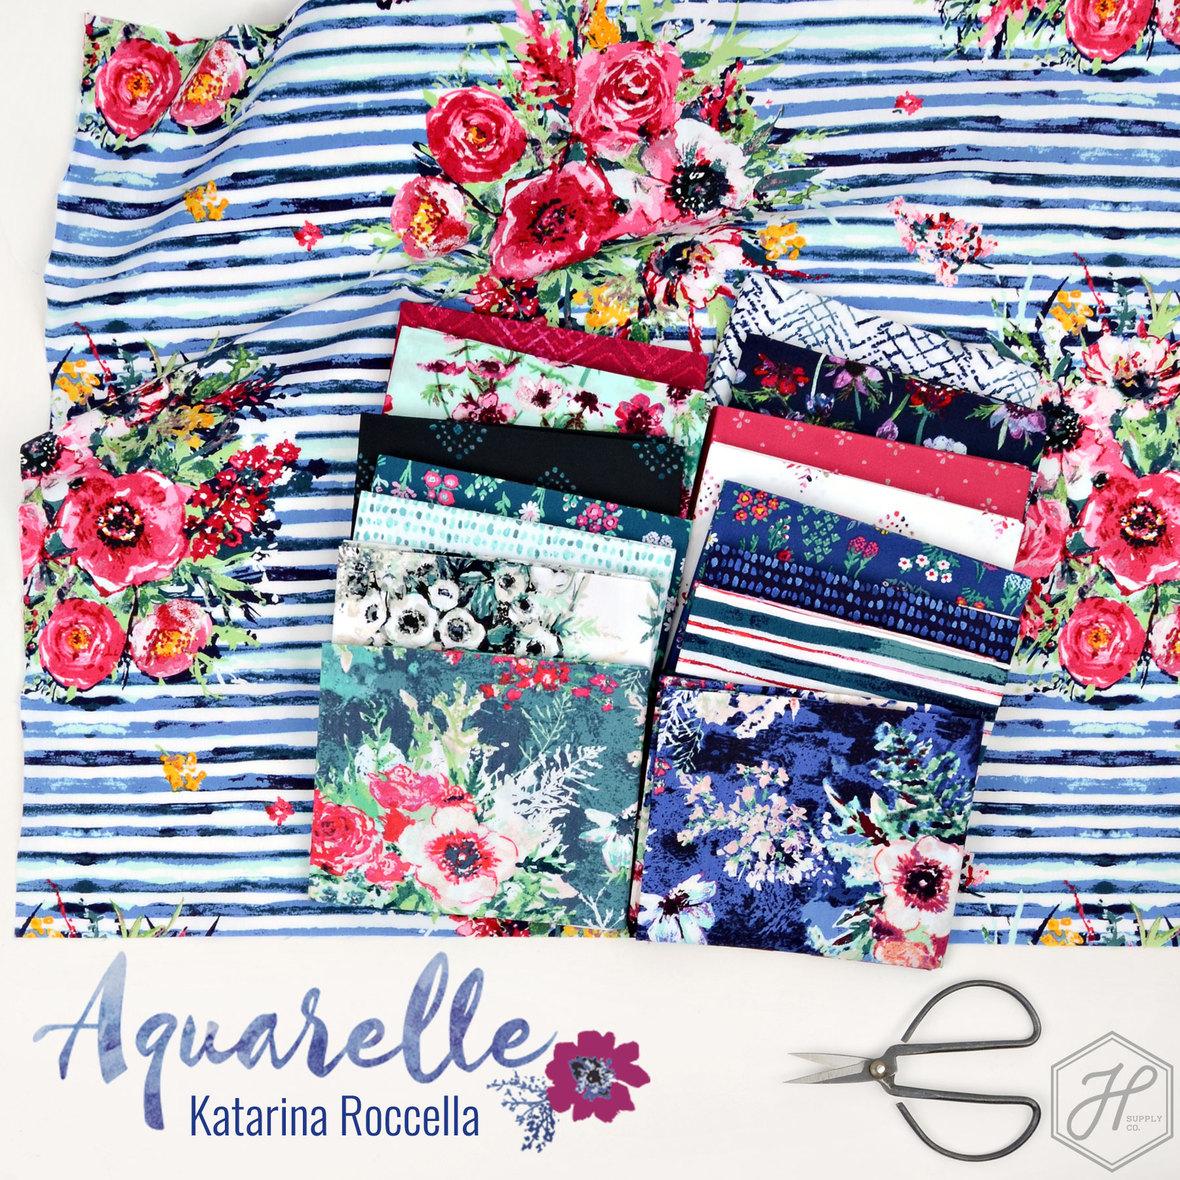 Aquarella-Fabric-Katarina-Roccella-for-Art-Gallery-at-Hawthorne-Supply-Co.